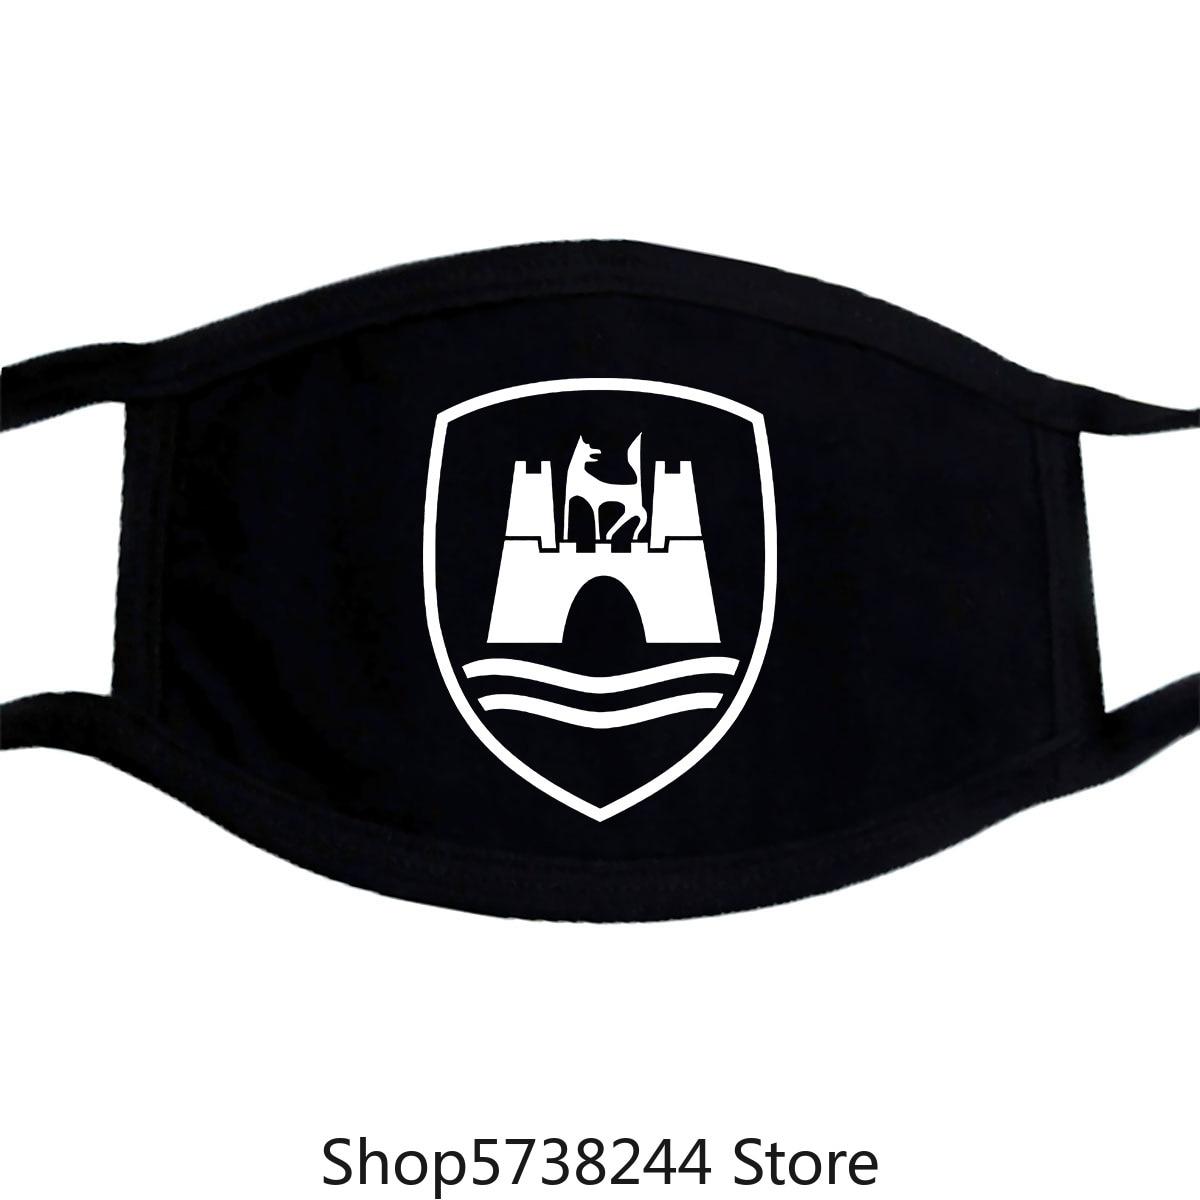 Mask Mask Wolfsburg Edition Mk1 Golf Gti Washable Reusable Mask For Unisex Black